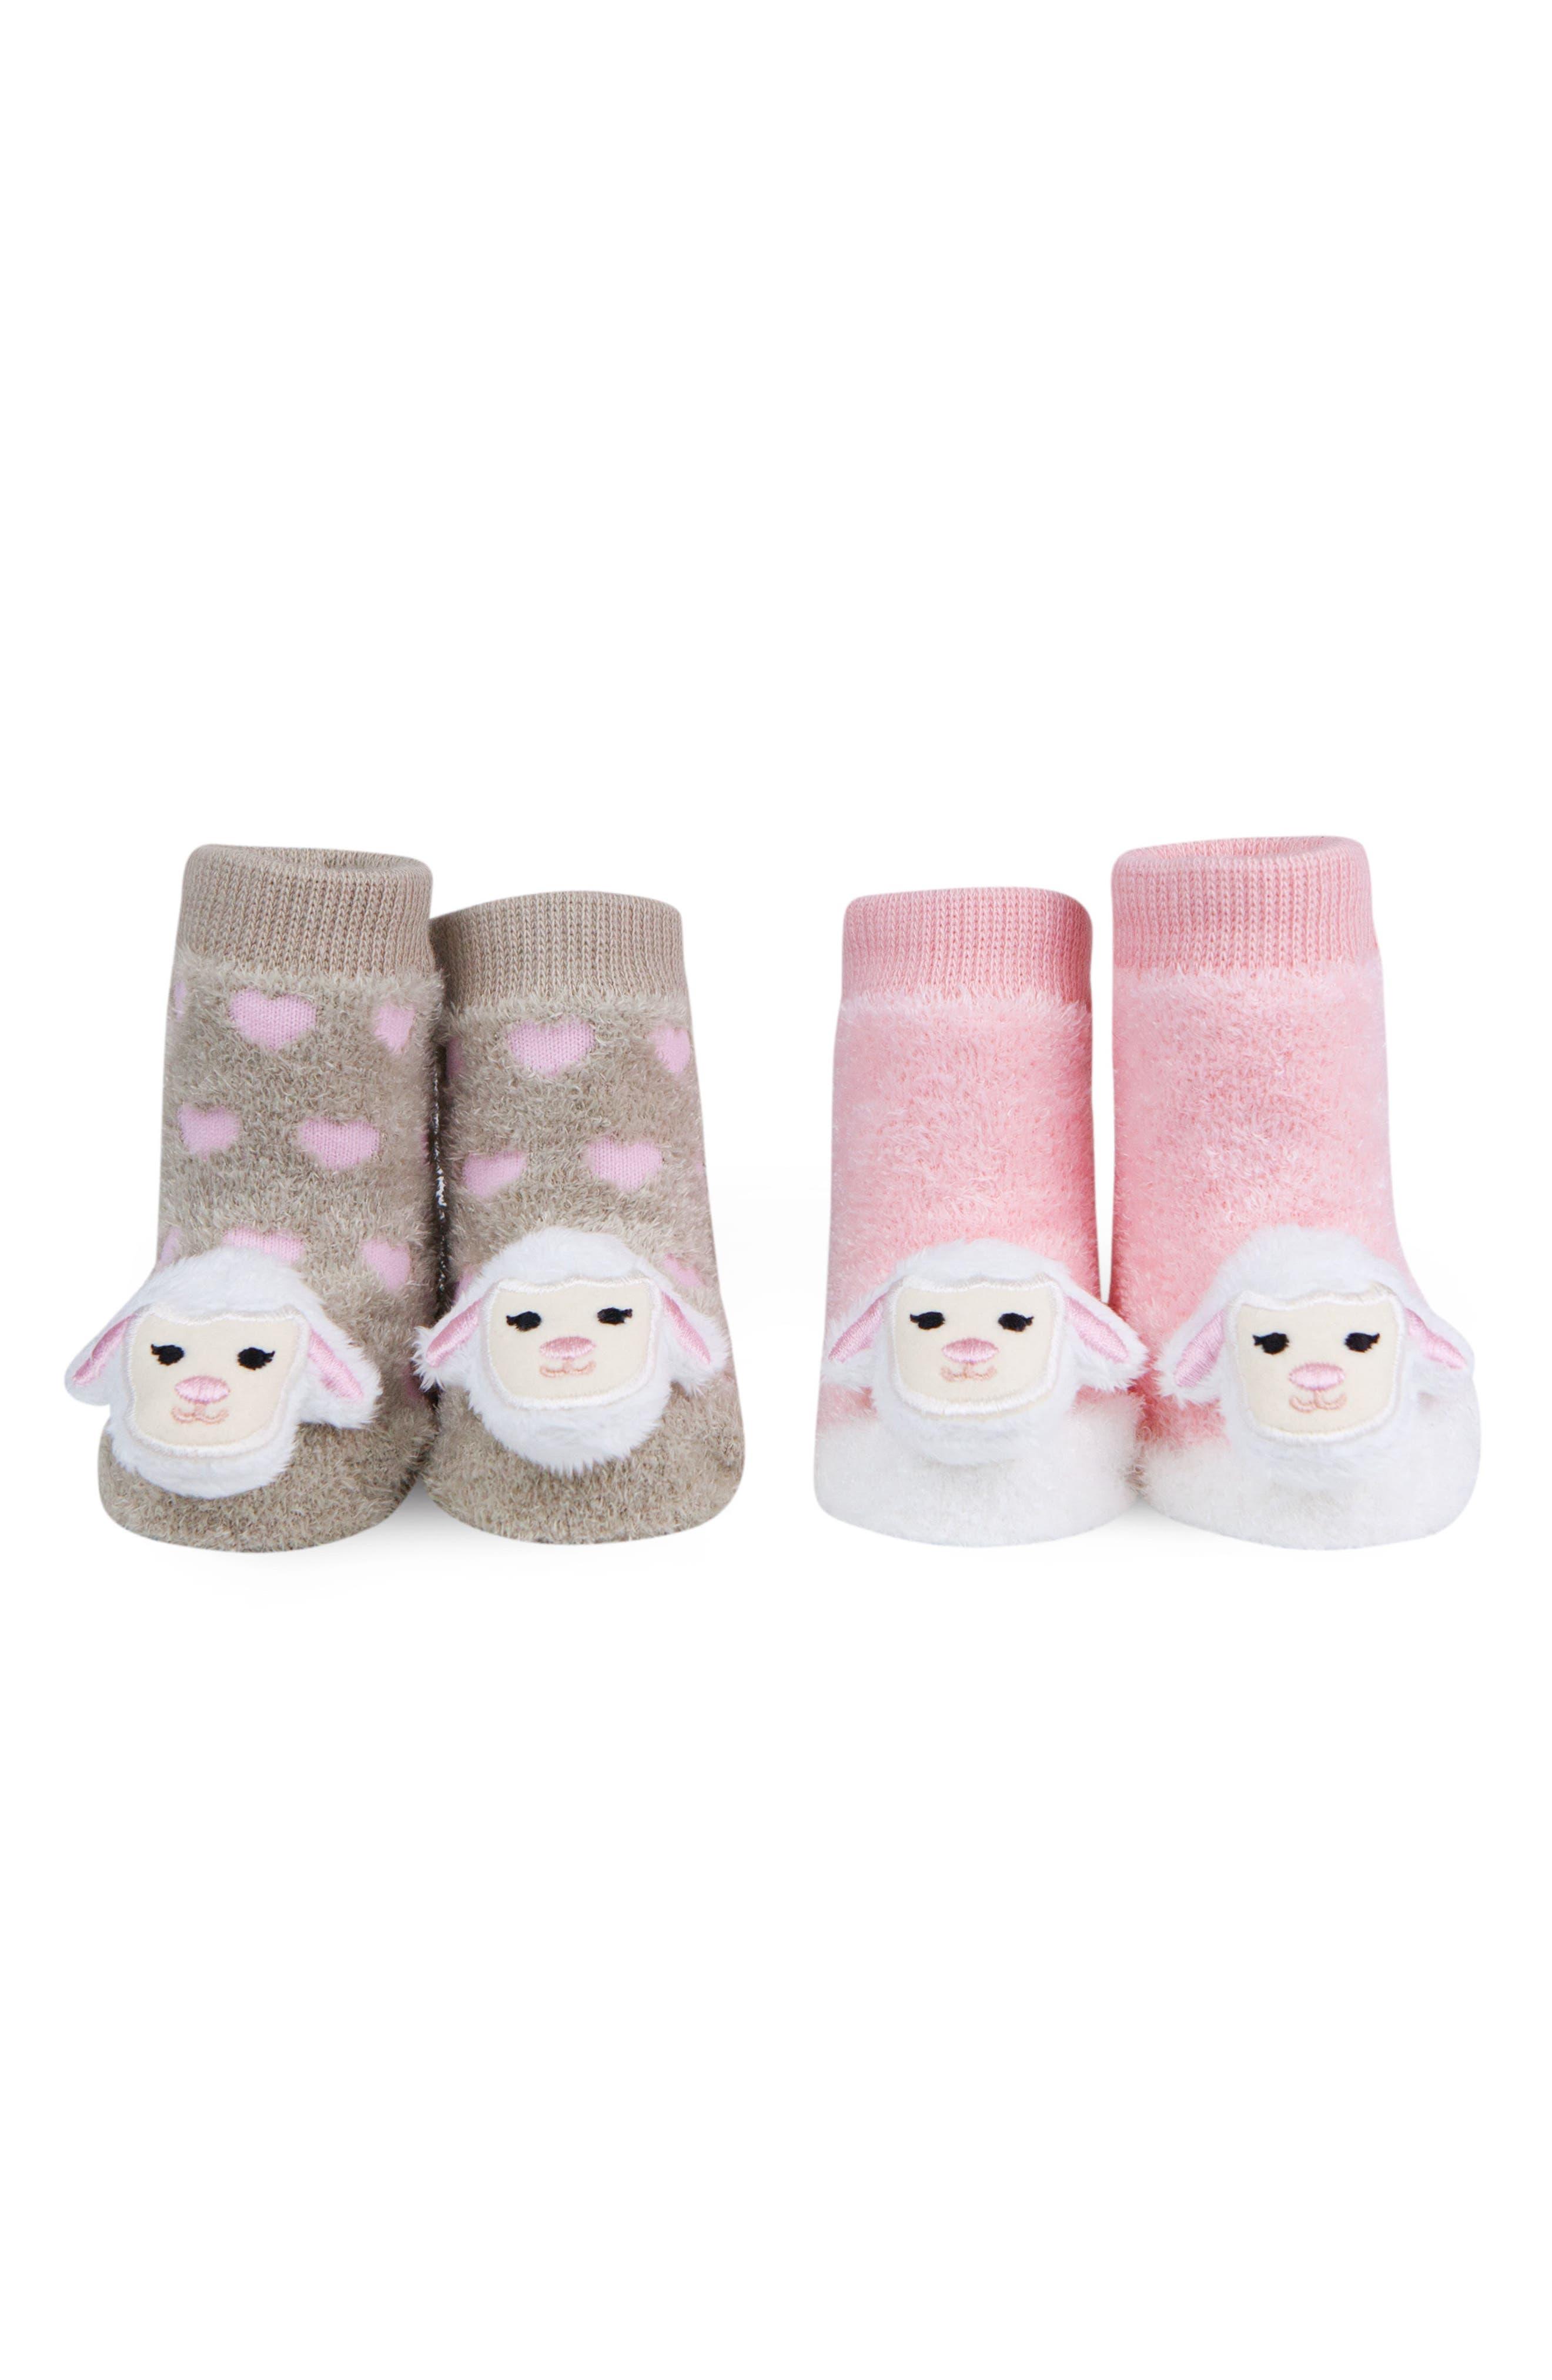 & Friends Lamb 2-Pack Rattle Socks,                         Main,                         color, Pink/ Light Brown